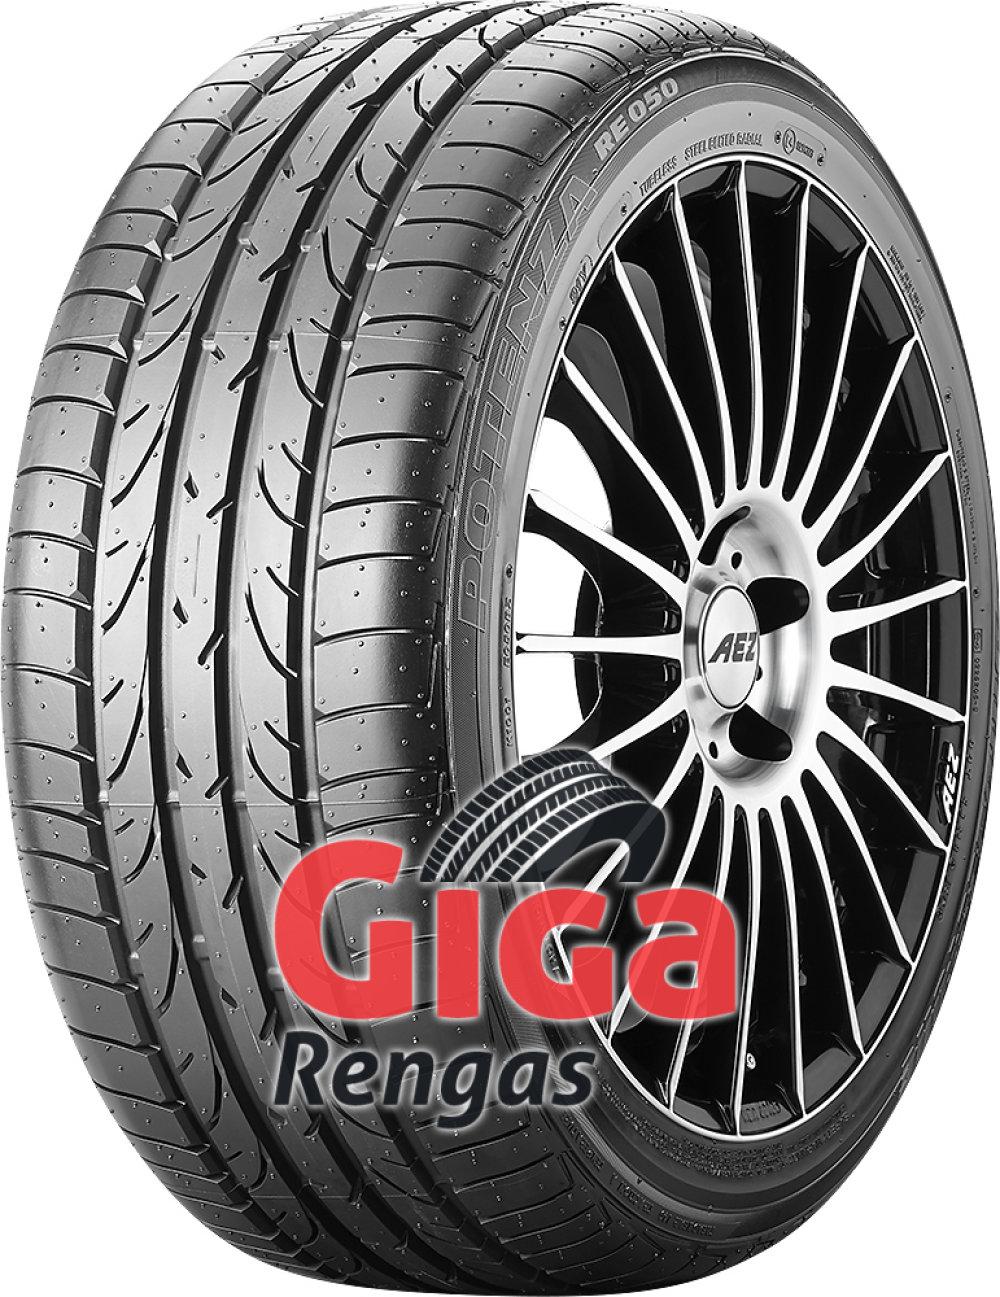 Bridgestone Potenza RE 050 RFT ( 245/45 R18 96Y vannesuojalla (MFS), runflat )